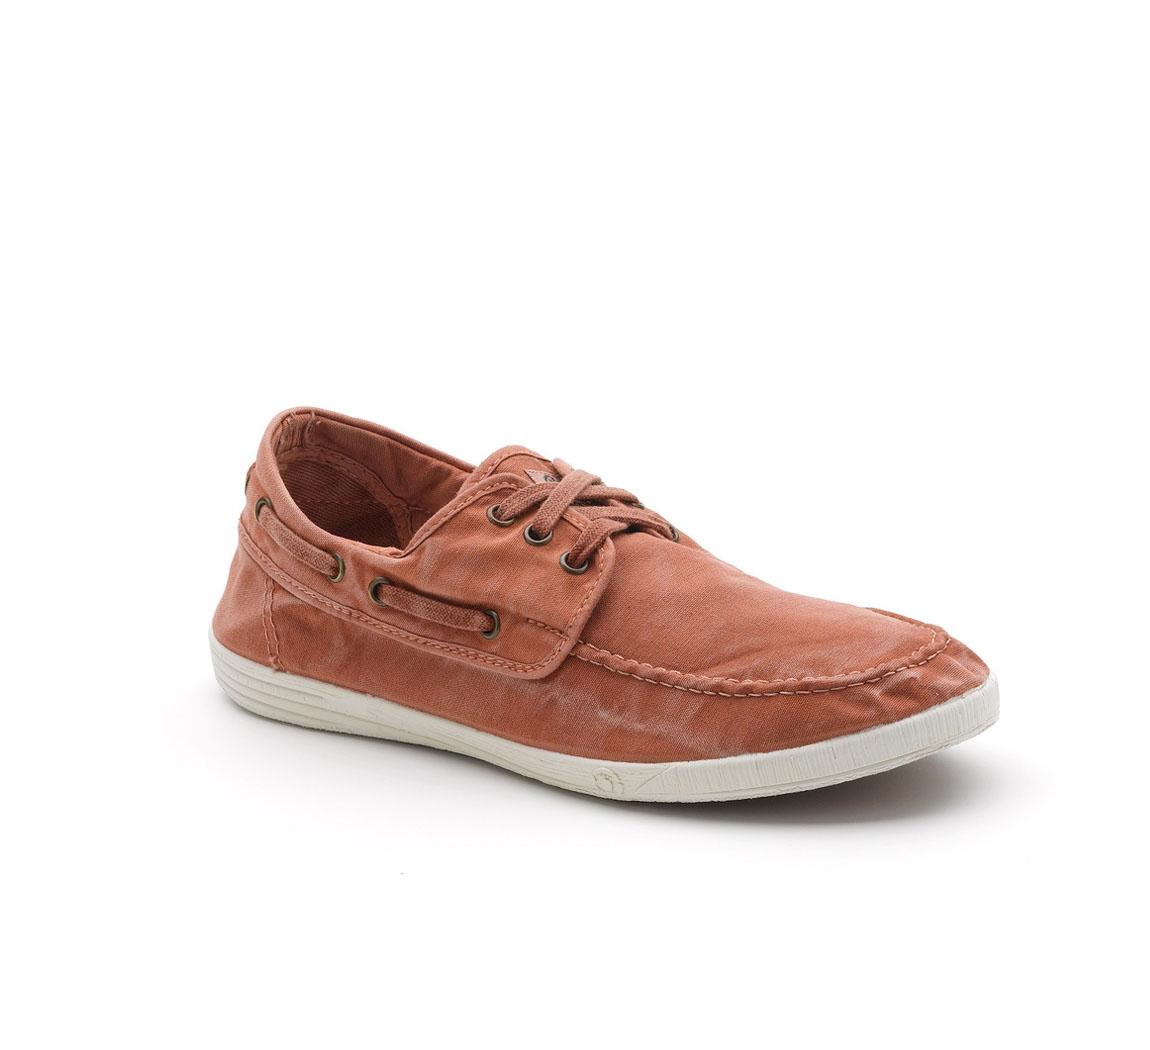 Chaussure homme Nautico  Nautico Tintado